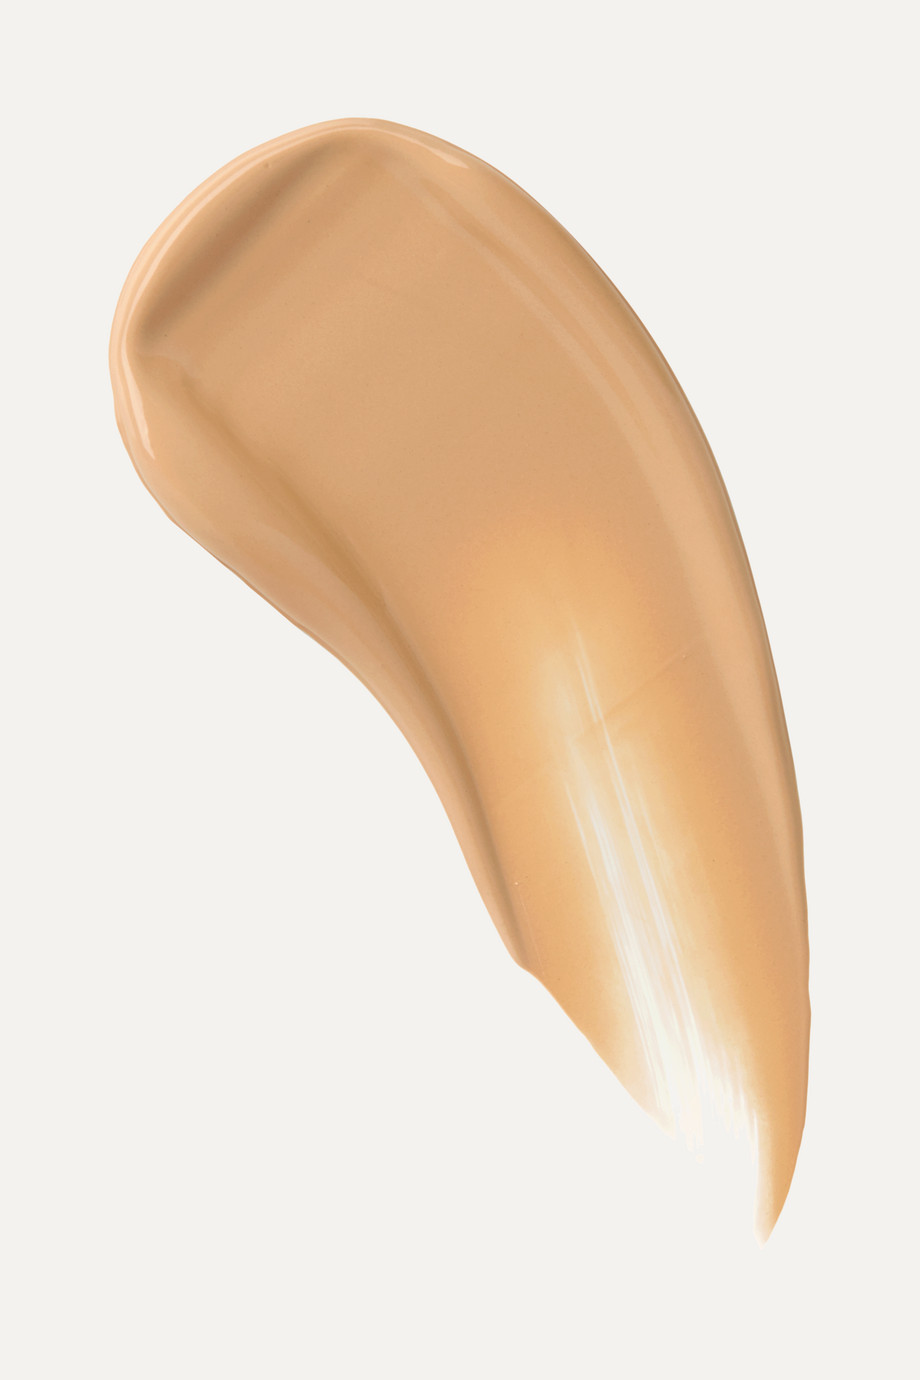 Charlotte Tilbury Magic Foundation Flawless Long-Lasting Coverage SPF15 - Shade 6, 30ml